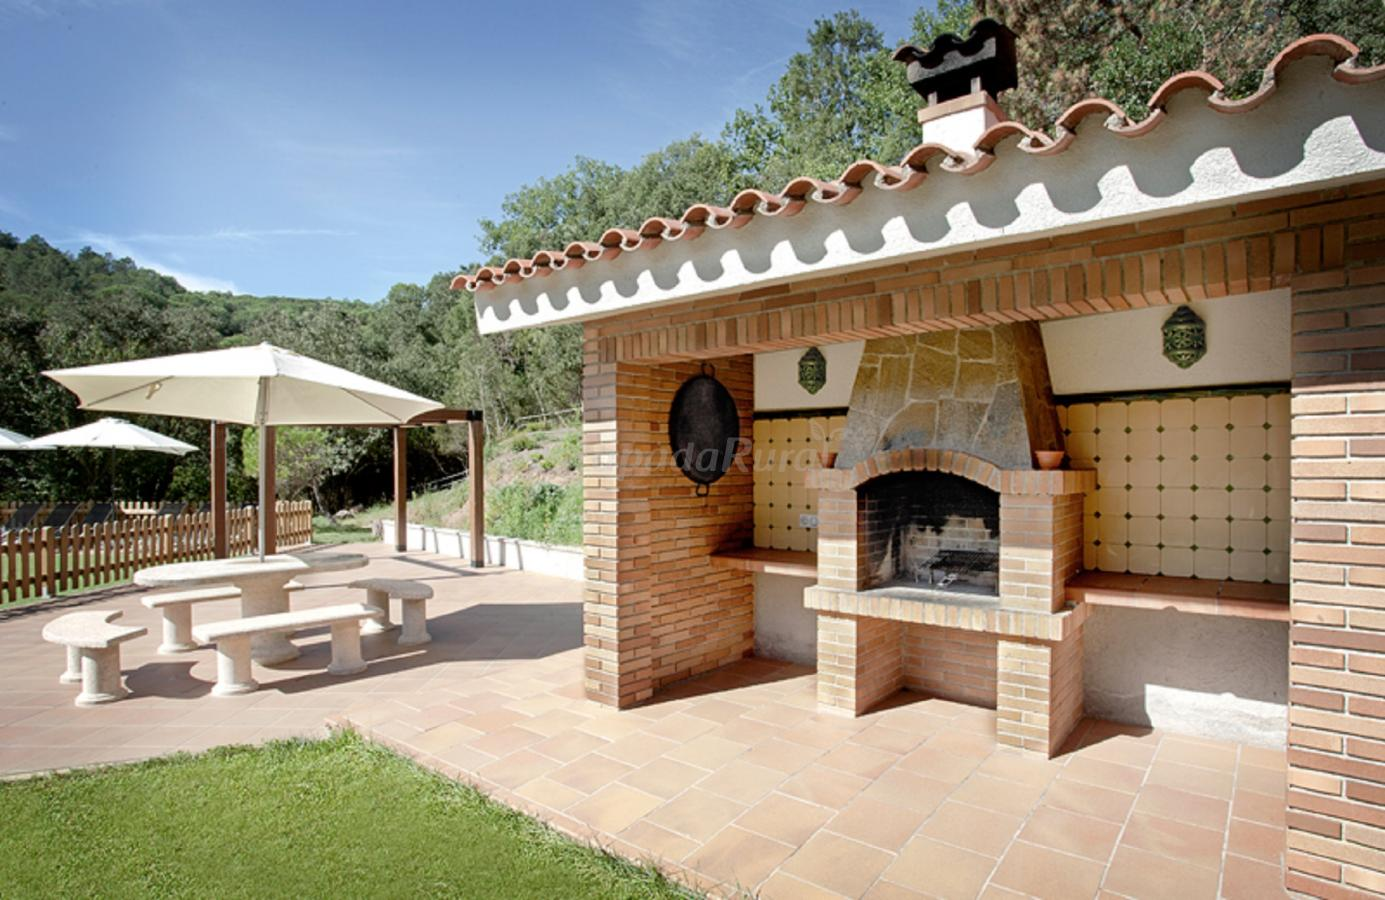 Fotos de cal moro casa rural en gualba barcelona - Casa rural economica barcelona ...